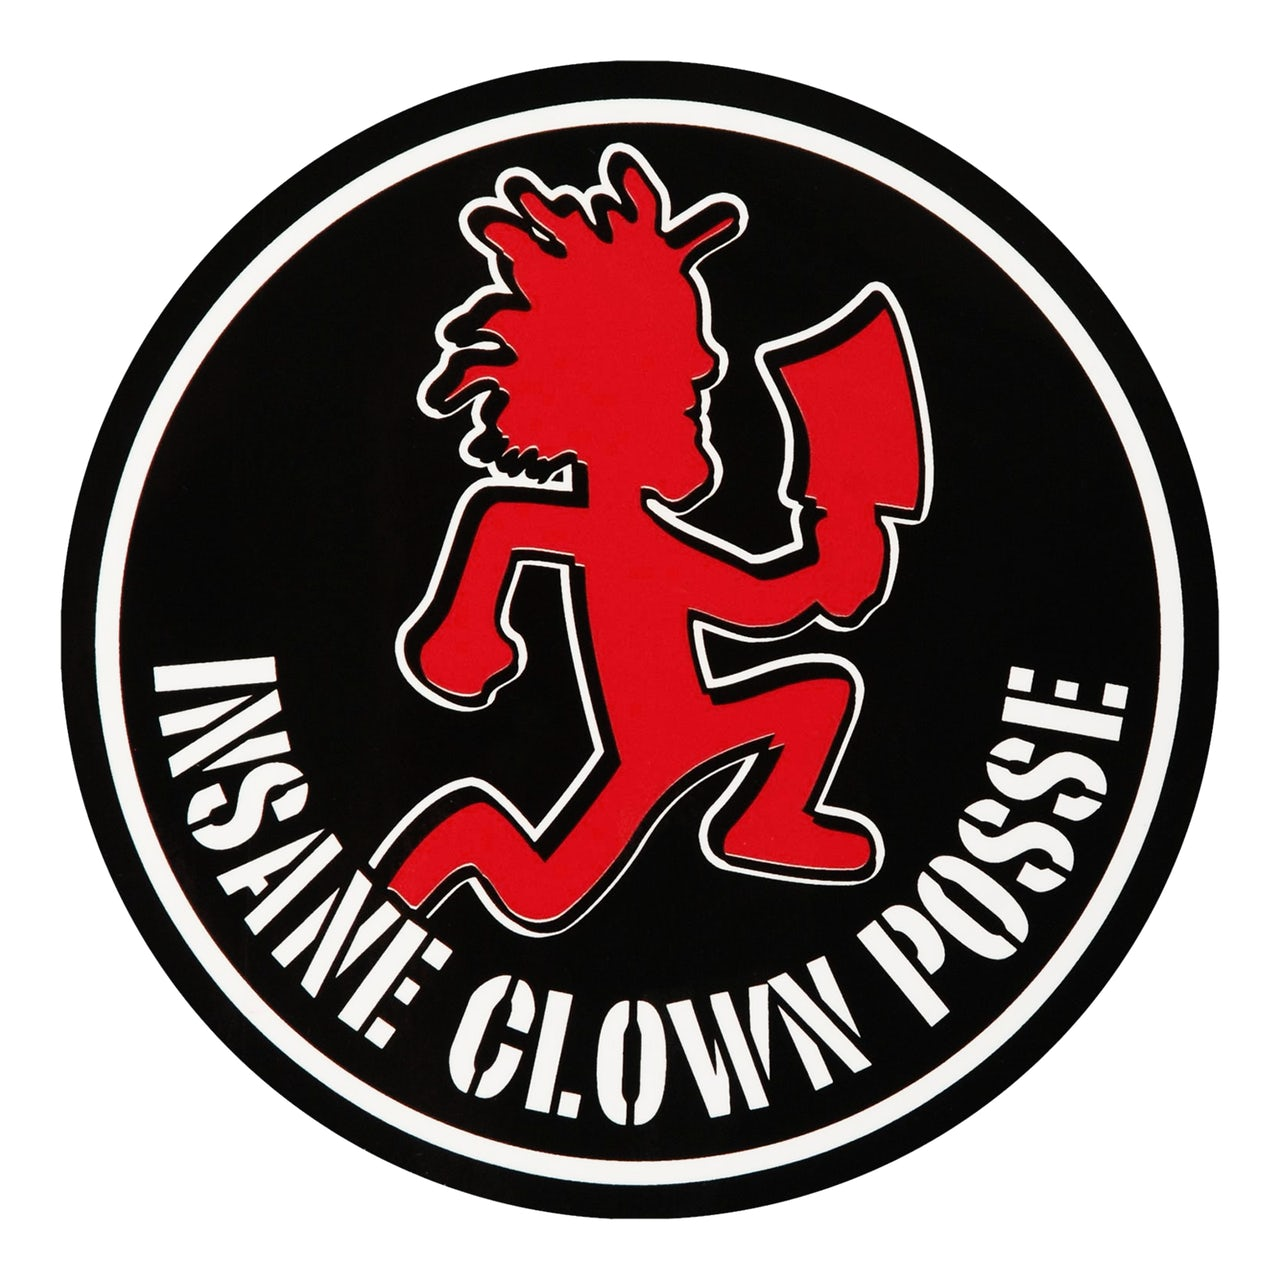 Insane Clown Posse Sticker.